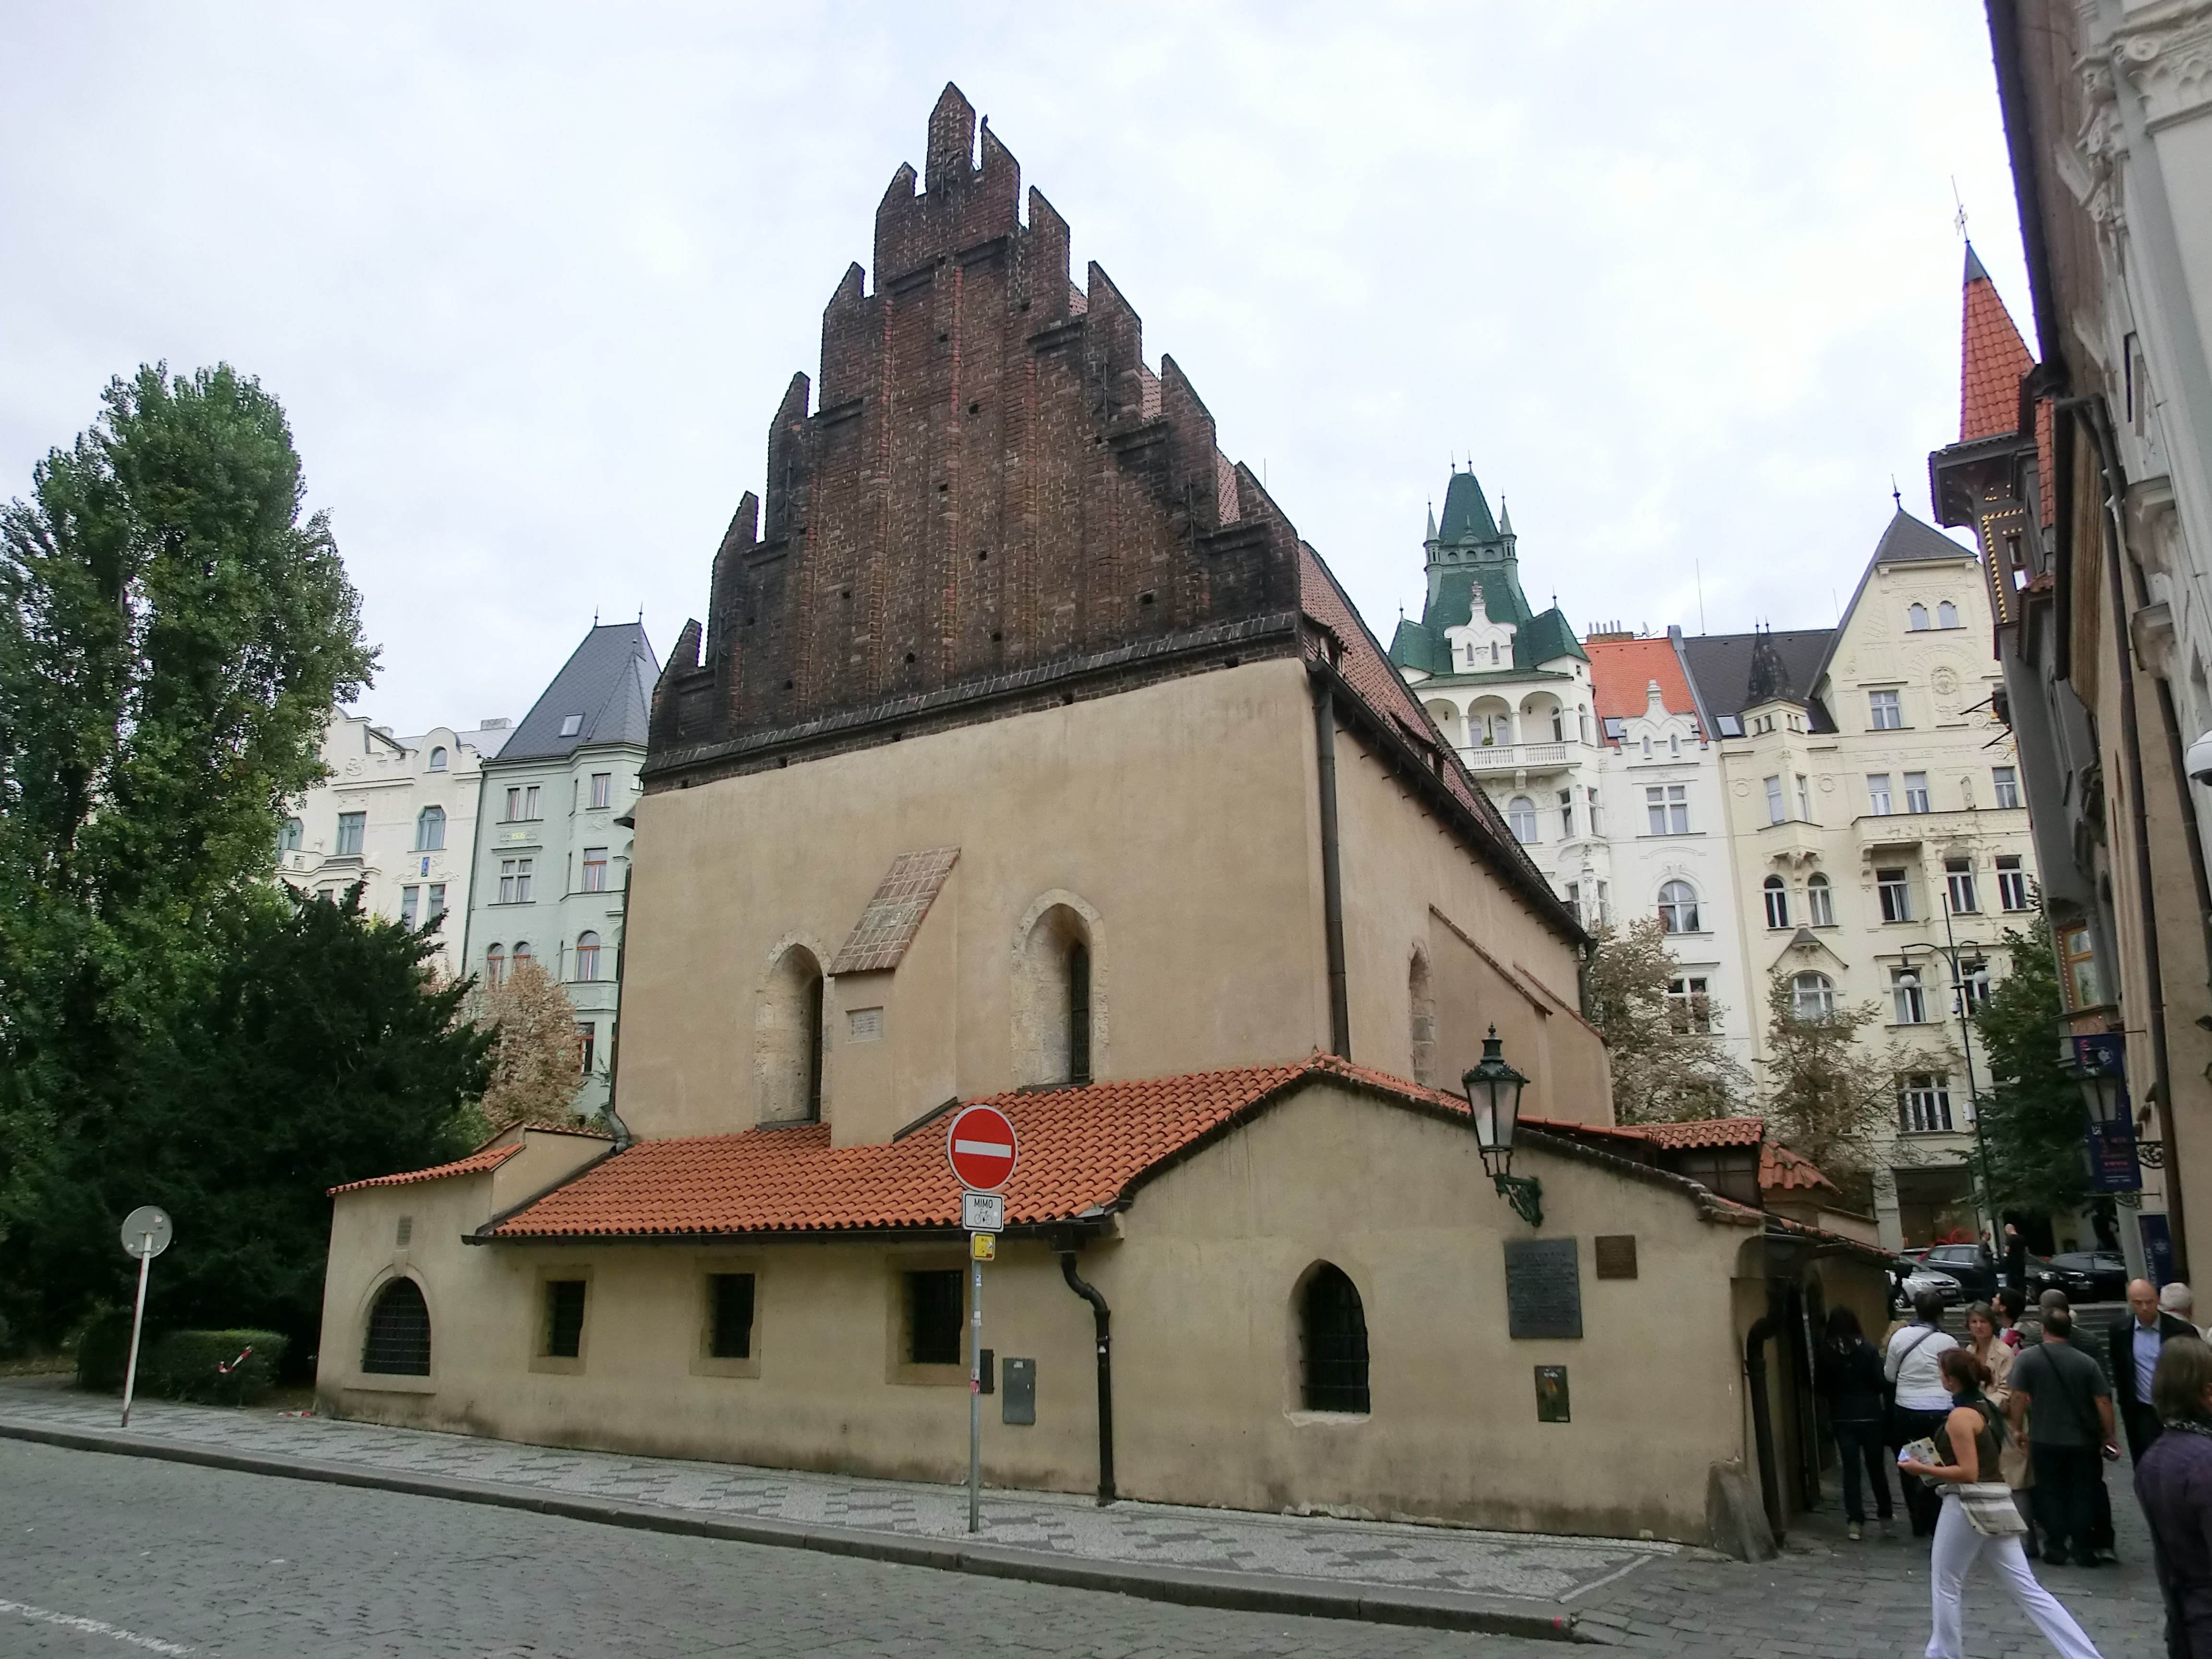 Praga - La sinagoga Staronova nel quartiere ebraico